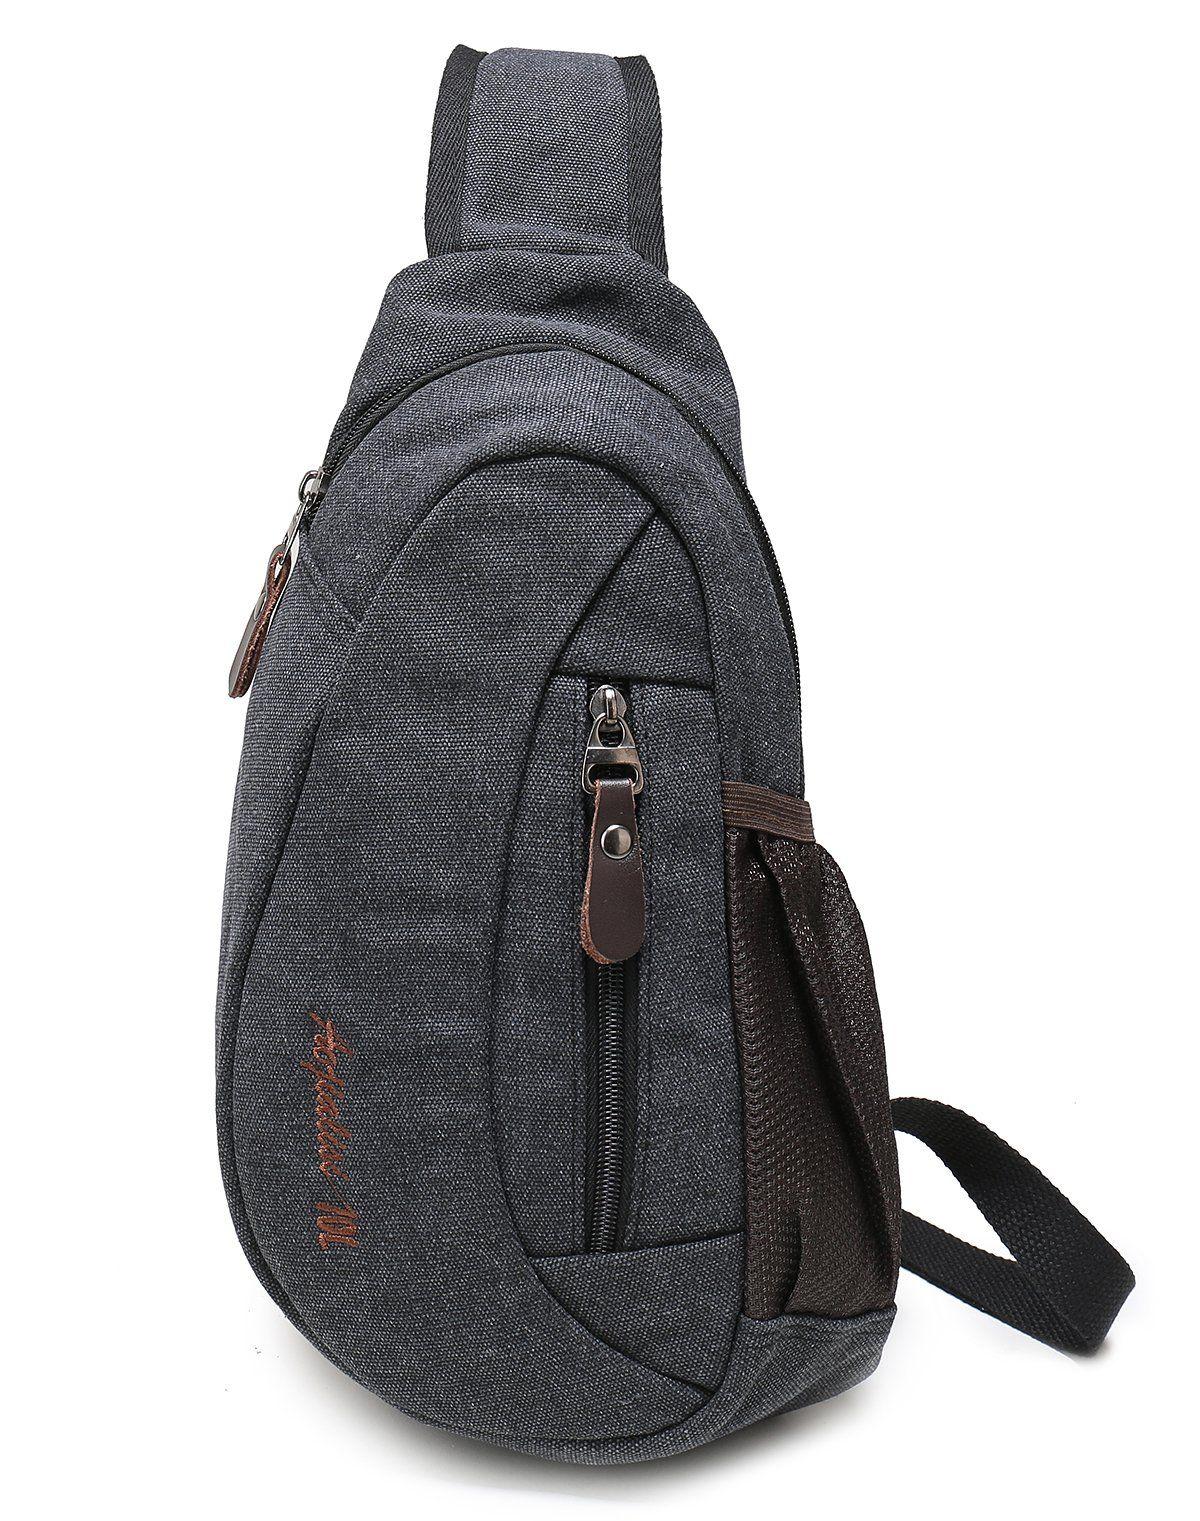 Weekend Shopper Shoulder Sling Bag Mini Backpack Cross Body Bag Crossbody  Backpack Chest Bag for Men 09df6eade8575